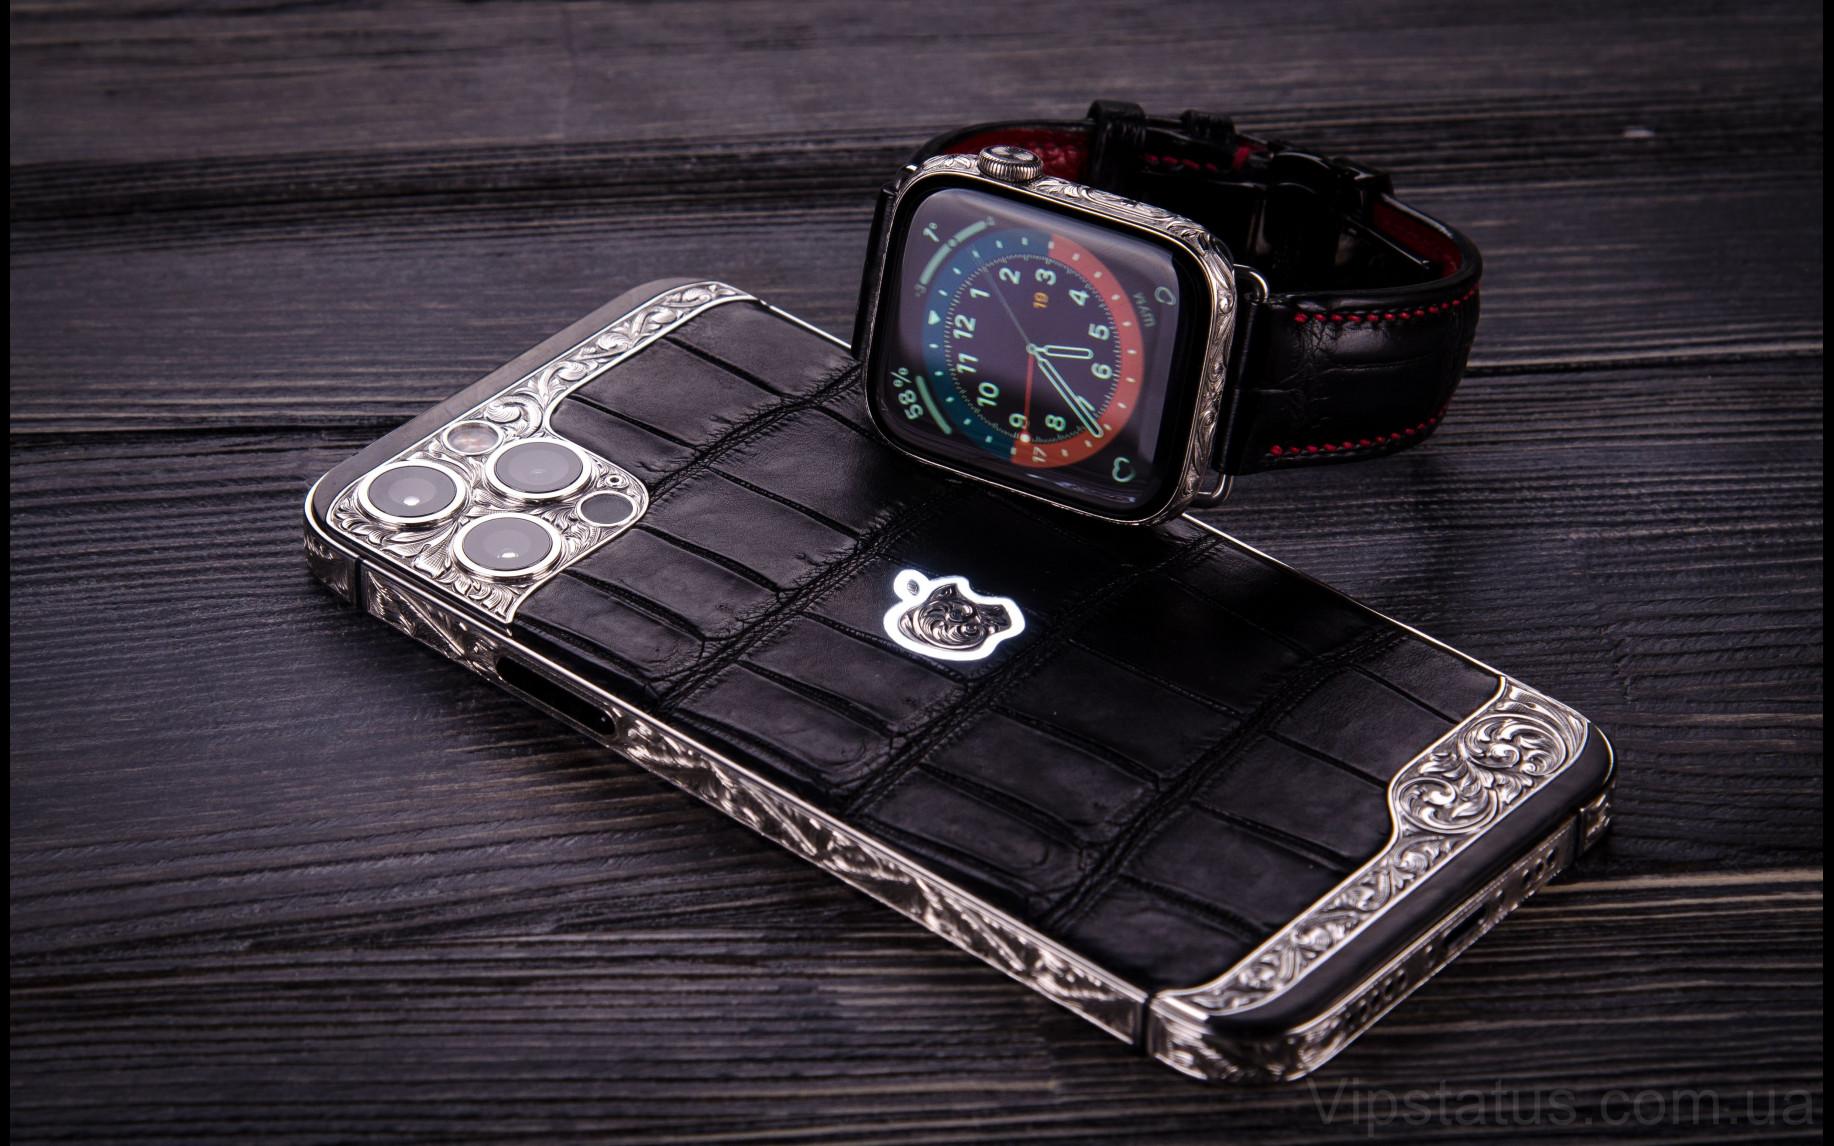 Elite Black Shadow IPHONE 12 PRO MAX 512 GB Black Shadow IPHONE 12 PRO MAX 512 GB image 8